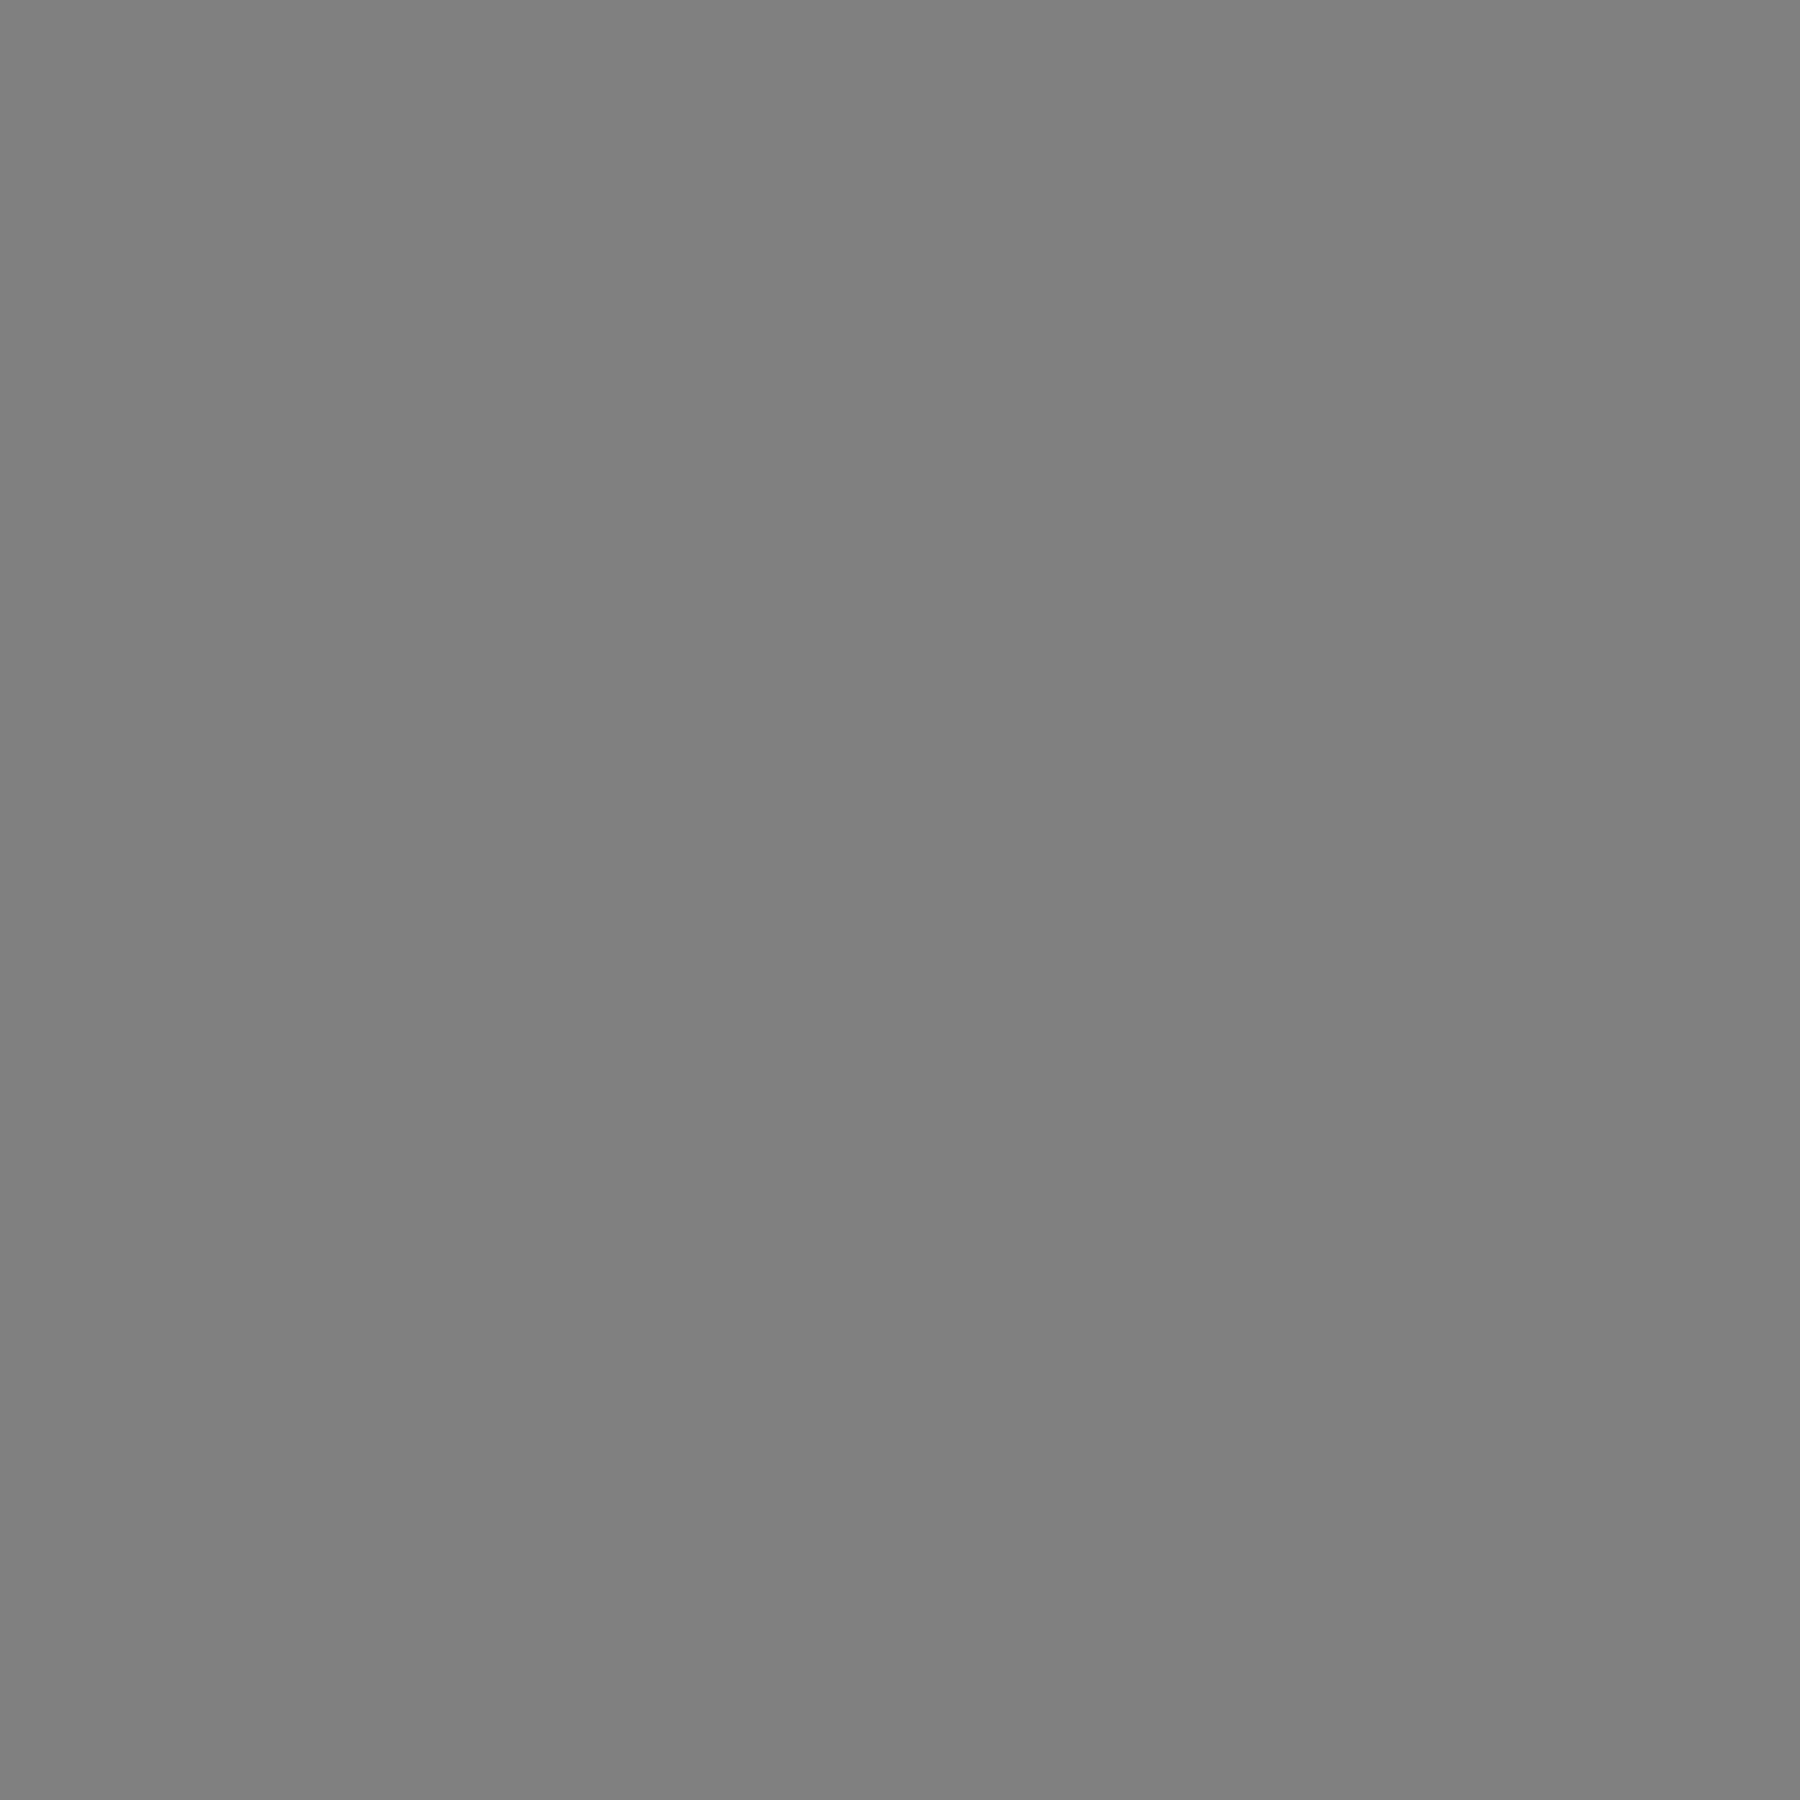 portait placeholder 5.jpg